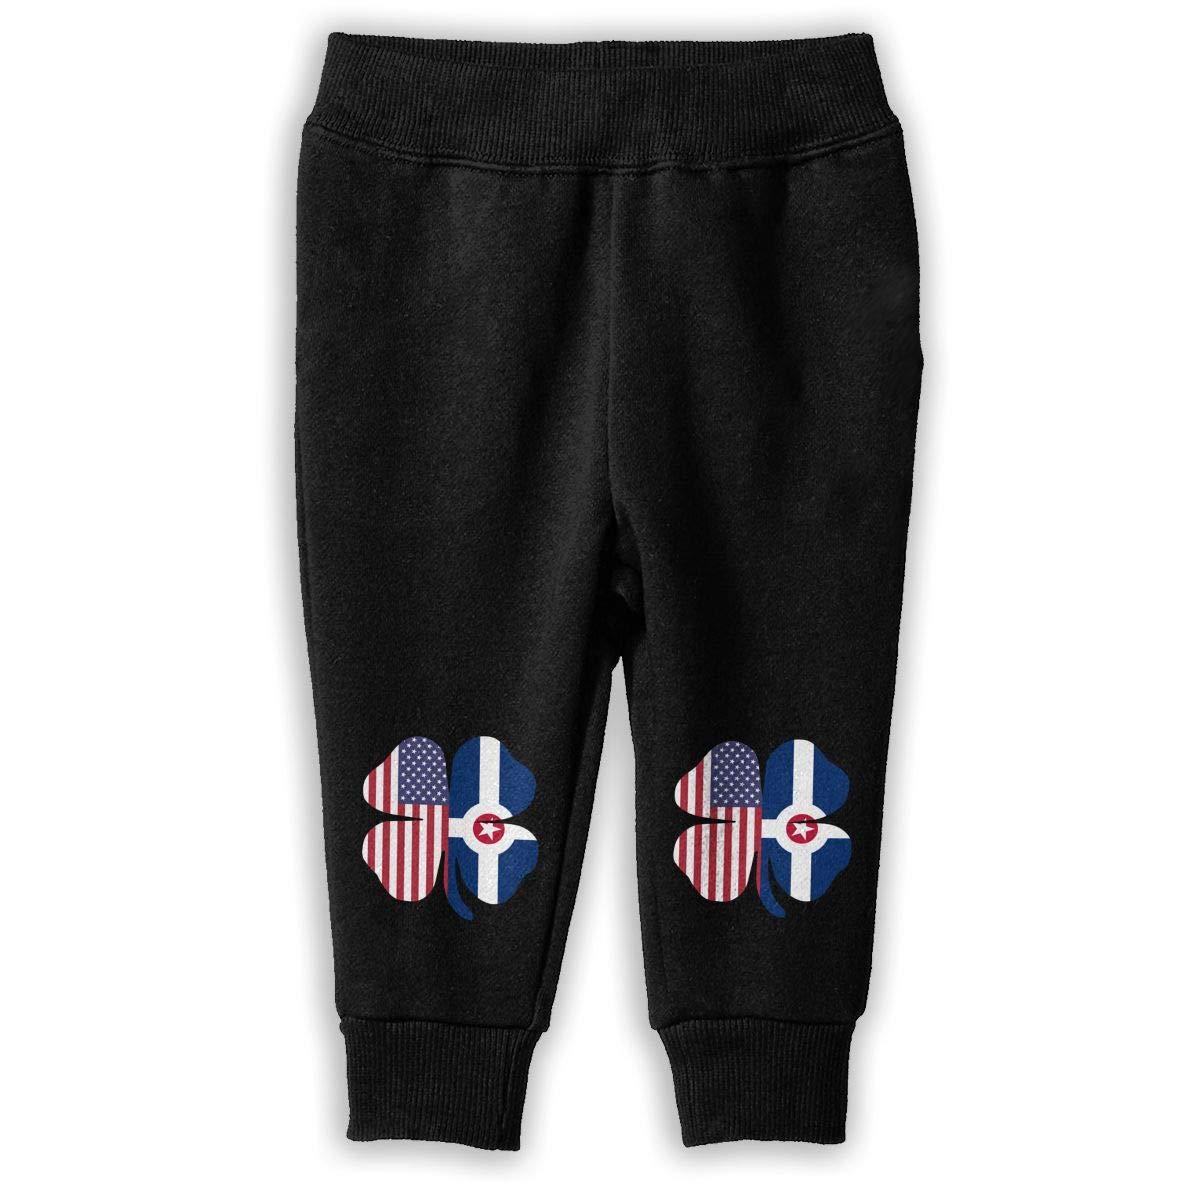 NJKM5MJ American Indianapolis Flag Shamrock Sweatpants Childrens Training Pants